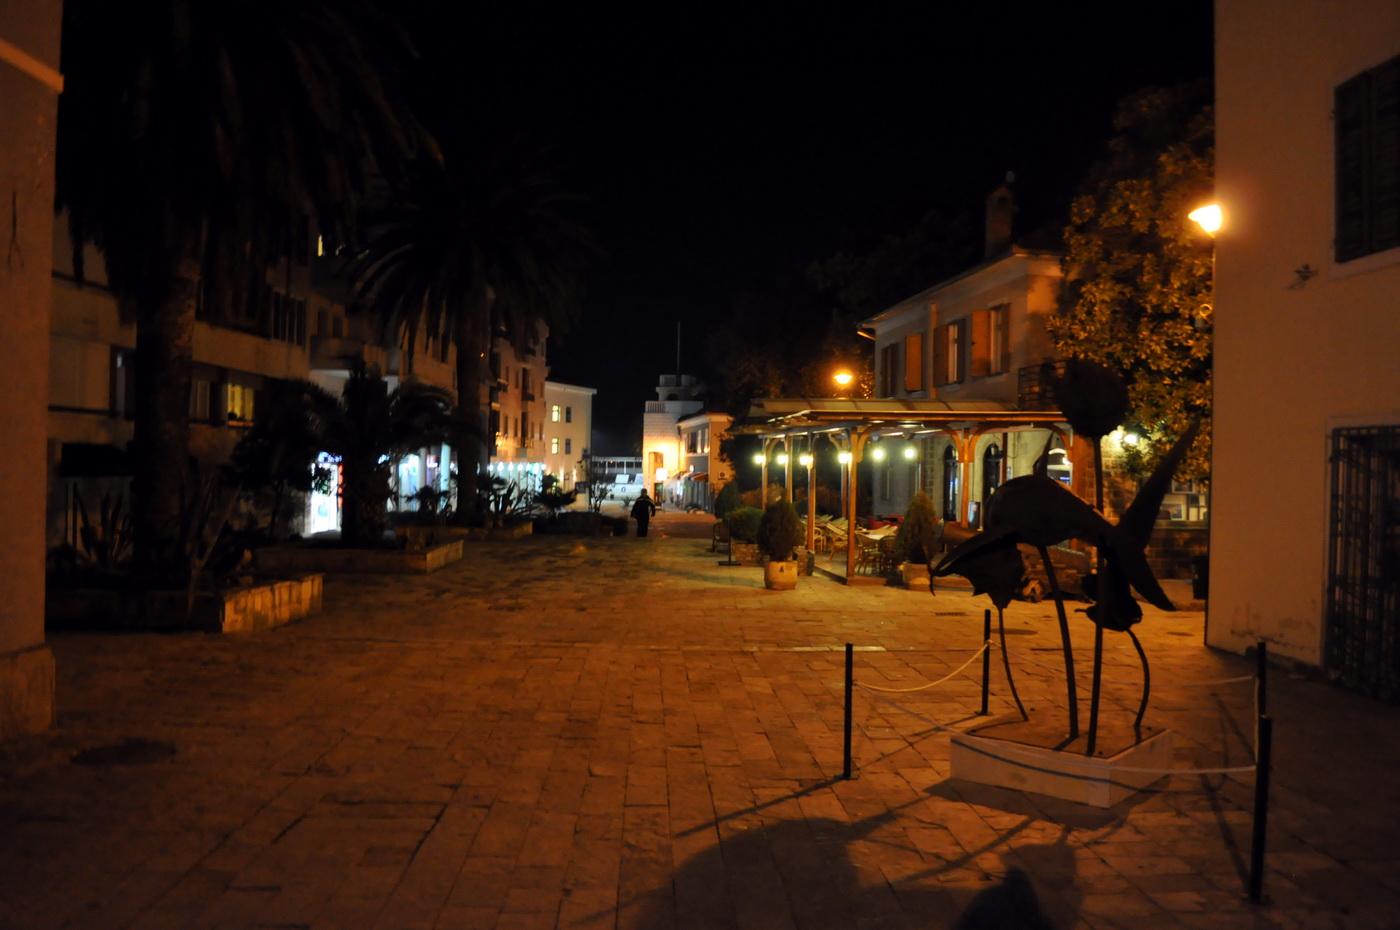 Tivat -Trg kullture večeras